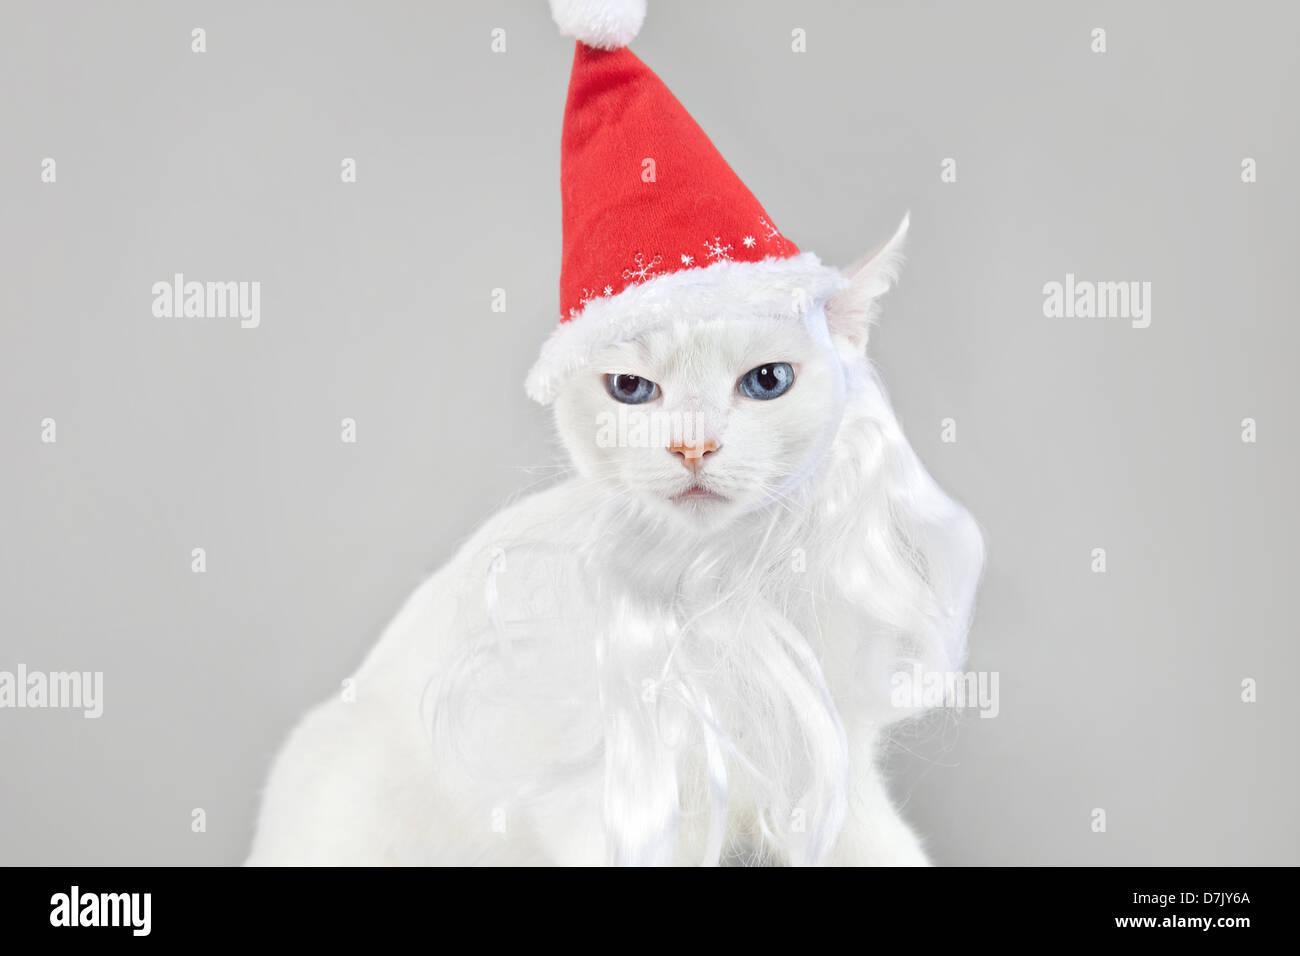 Santa cat portrait against grey background Stock Photo